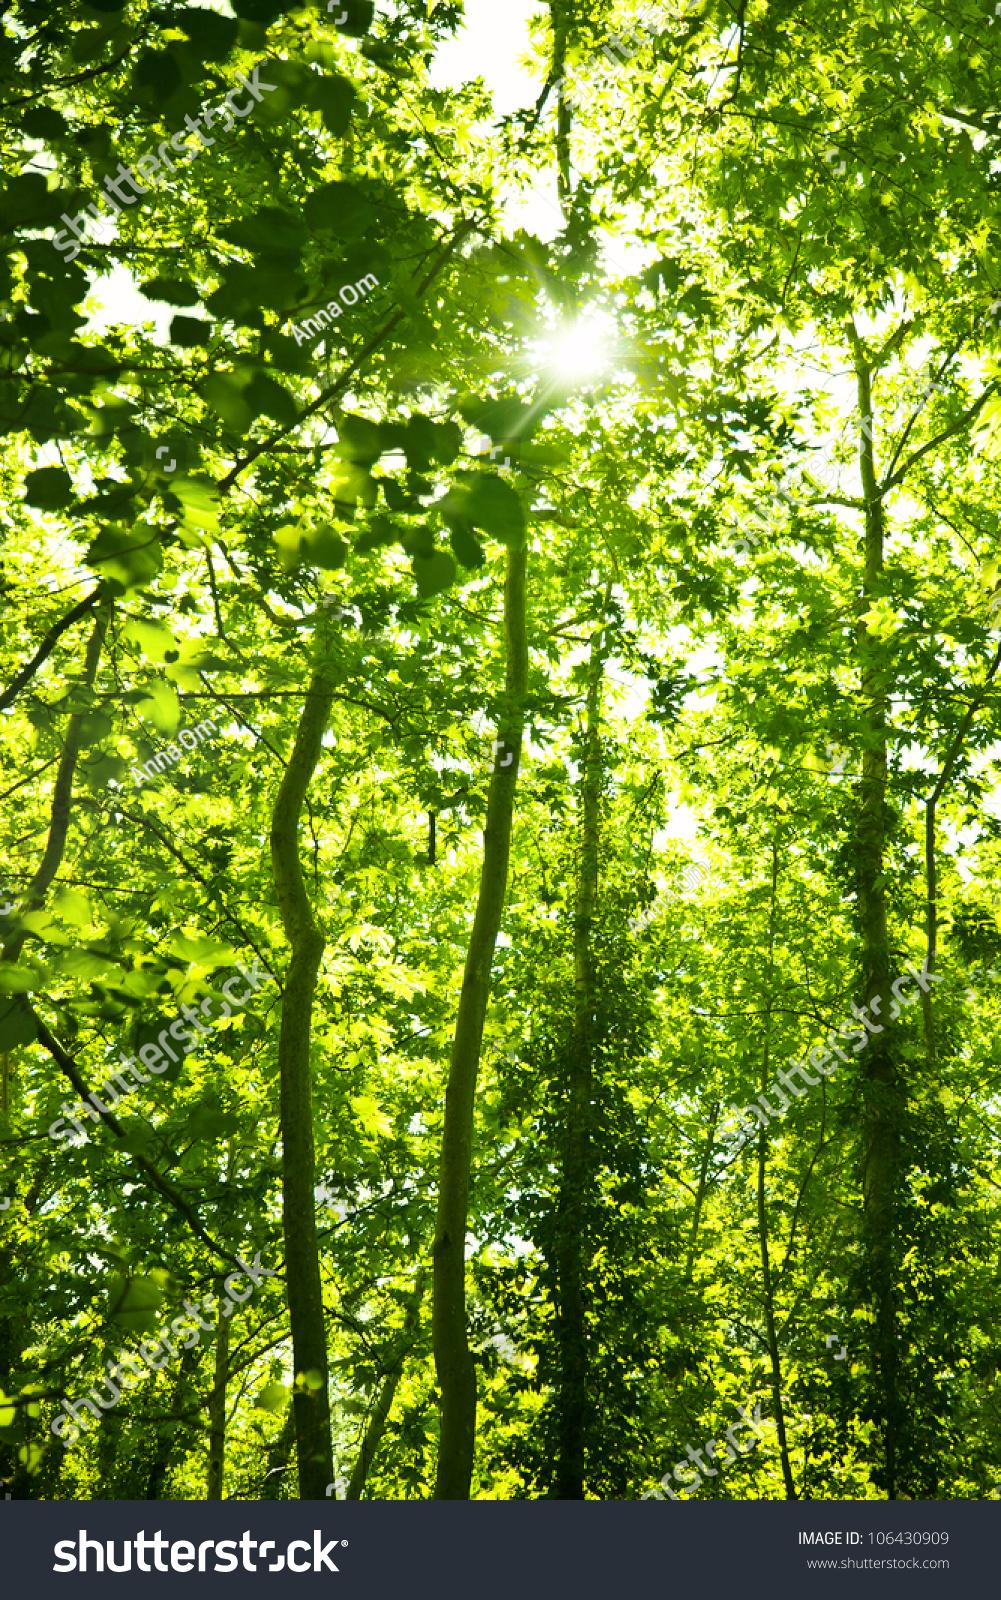 nature spring green tree - photo #31